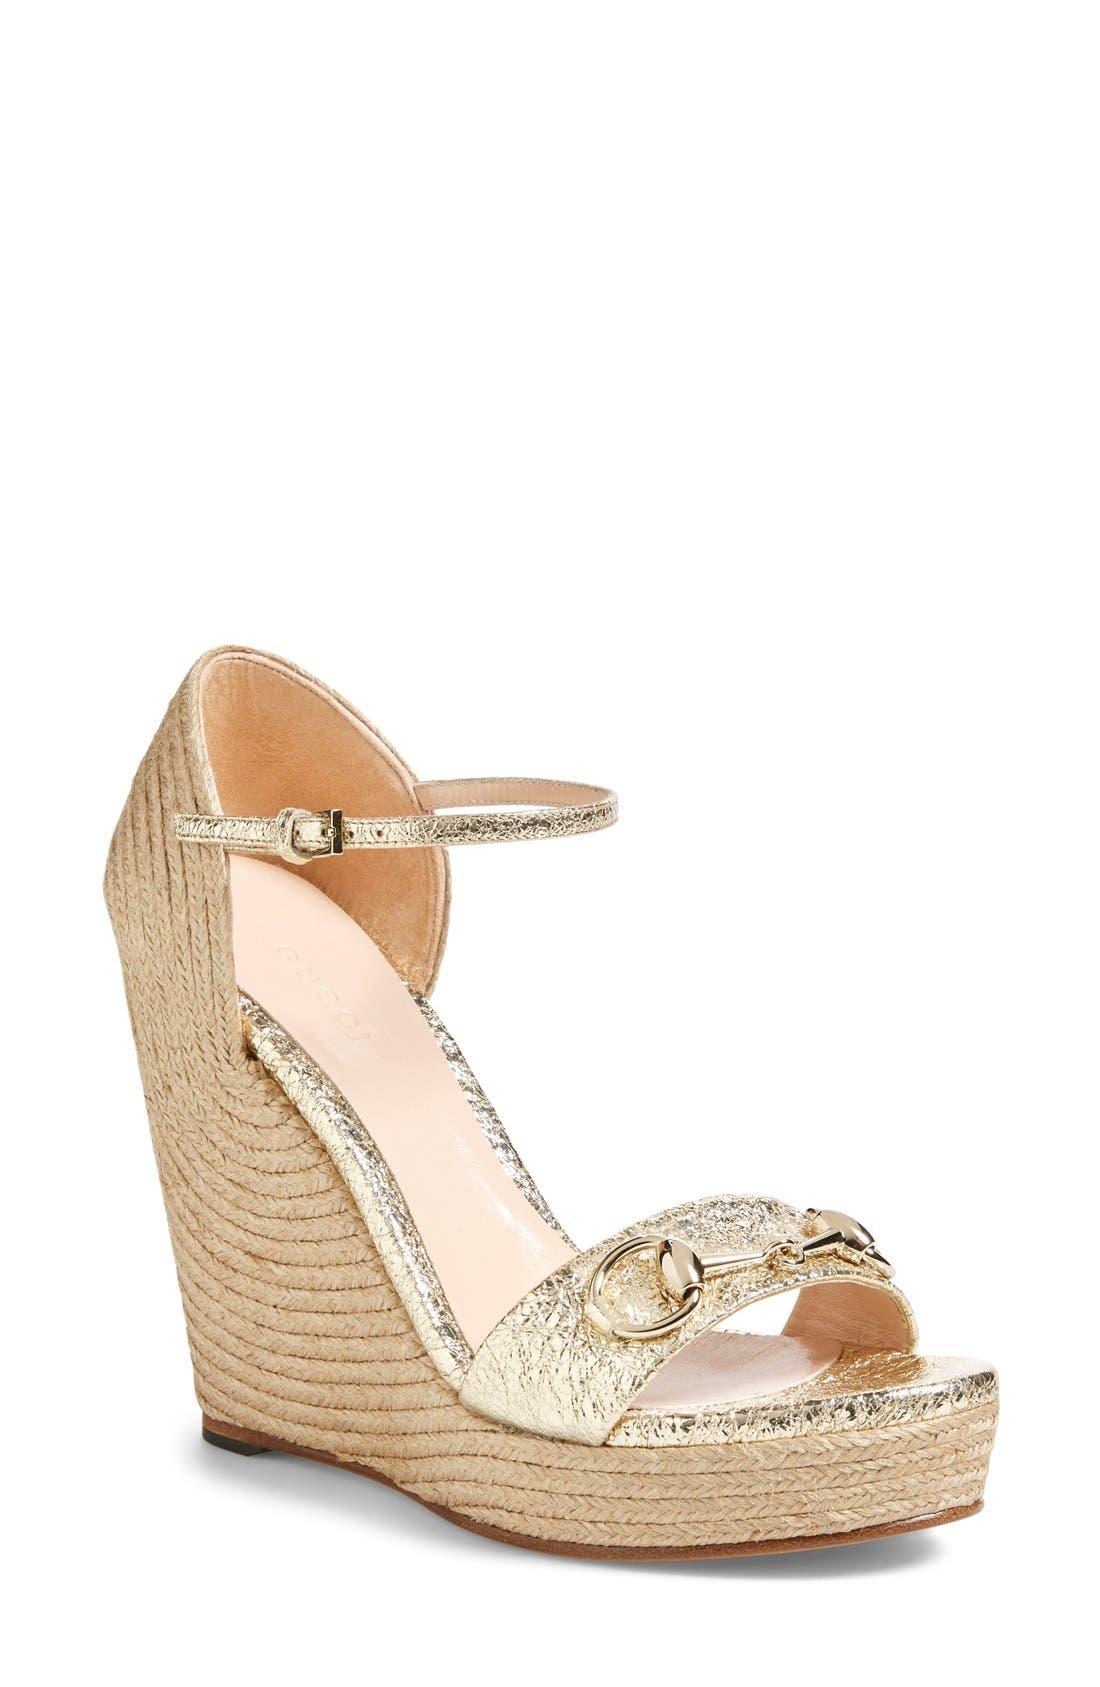 Main Image - Gucci 'Carolina' Wedge Sandal (Women)